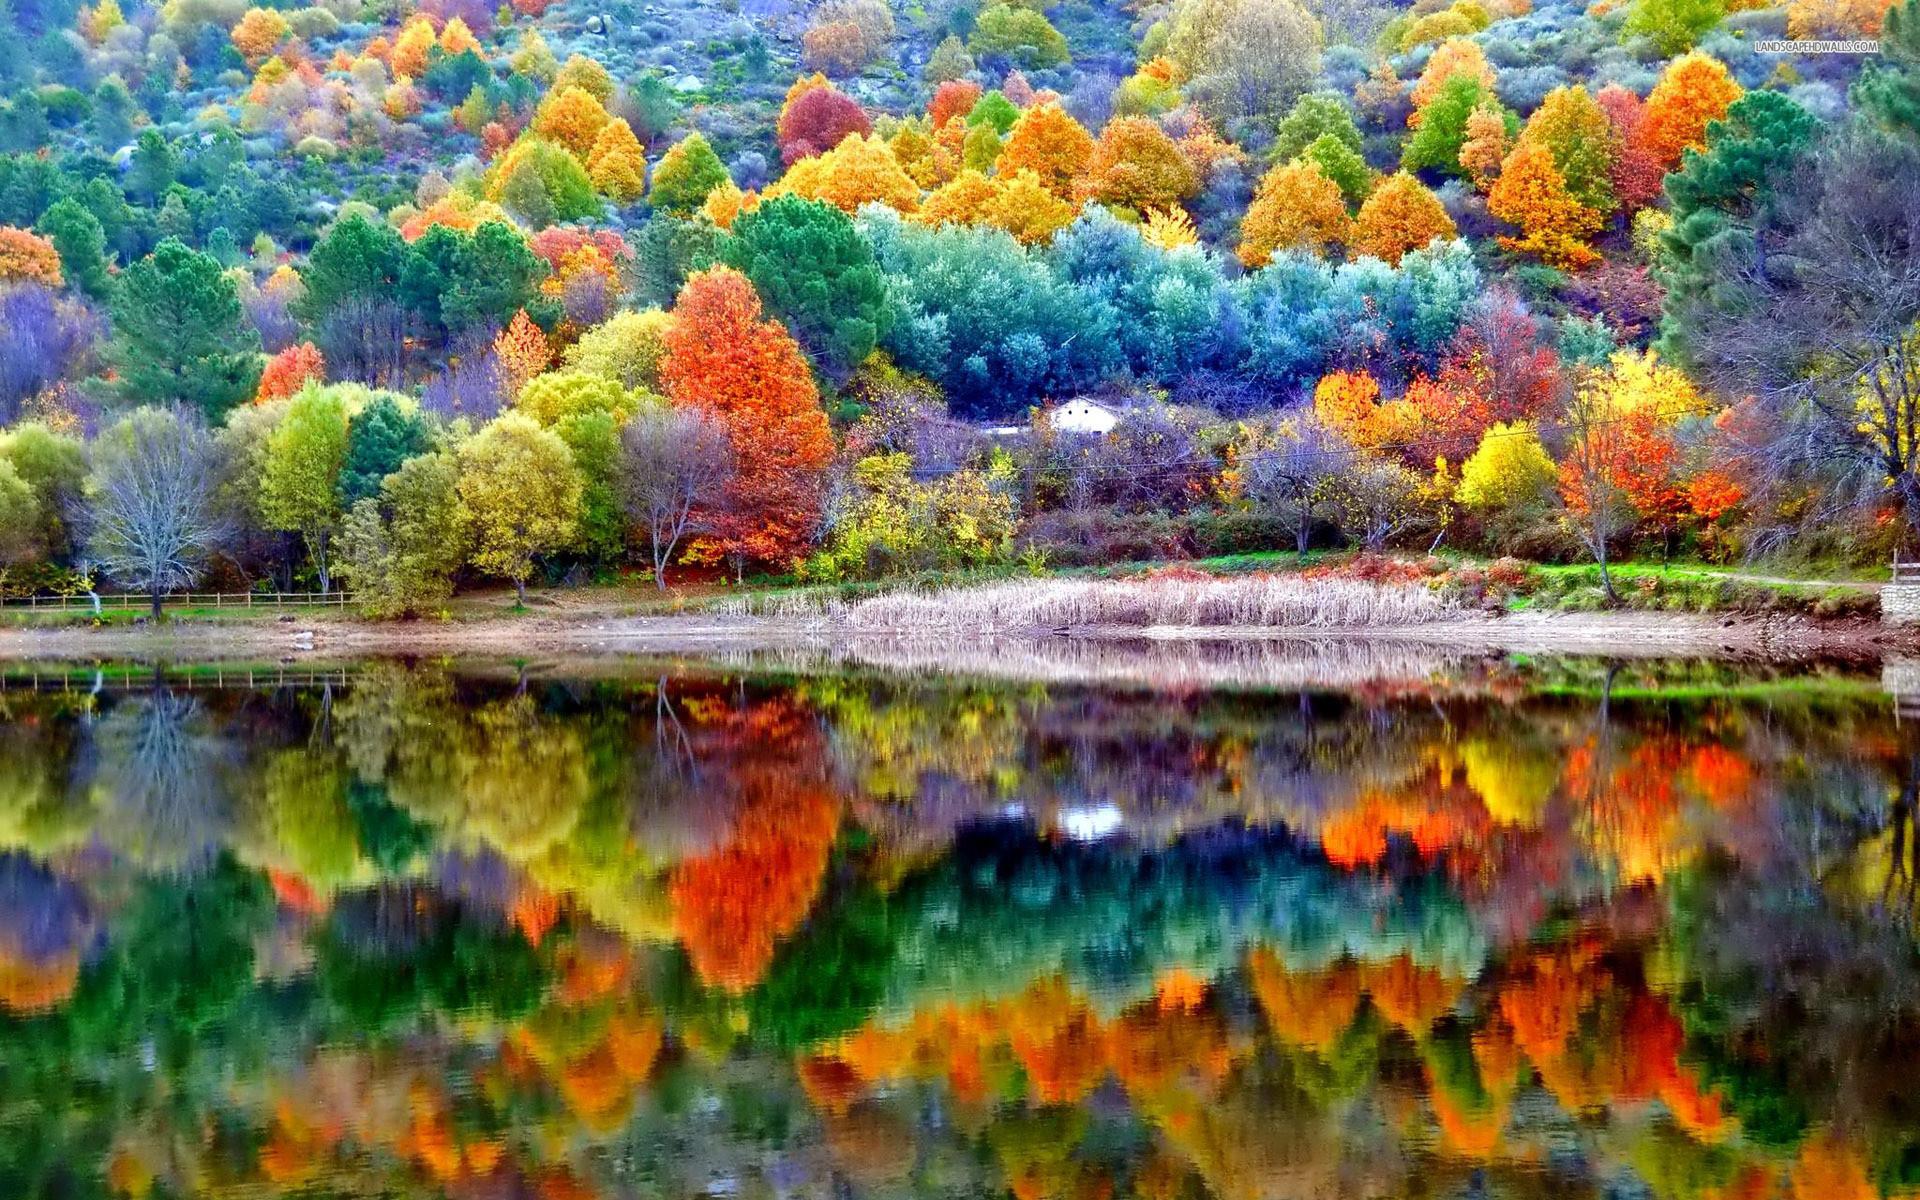 Fall Landscape Wallpaper | Beautiful autumn scenery wallpaper